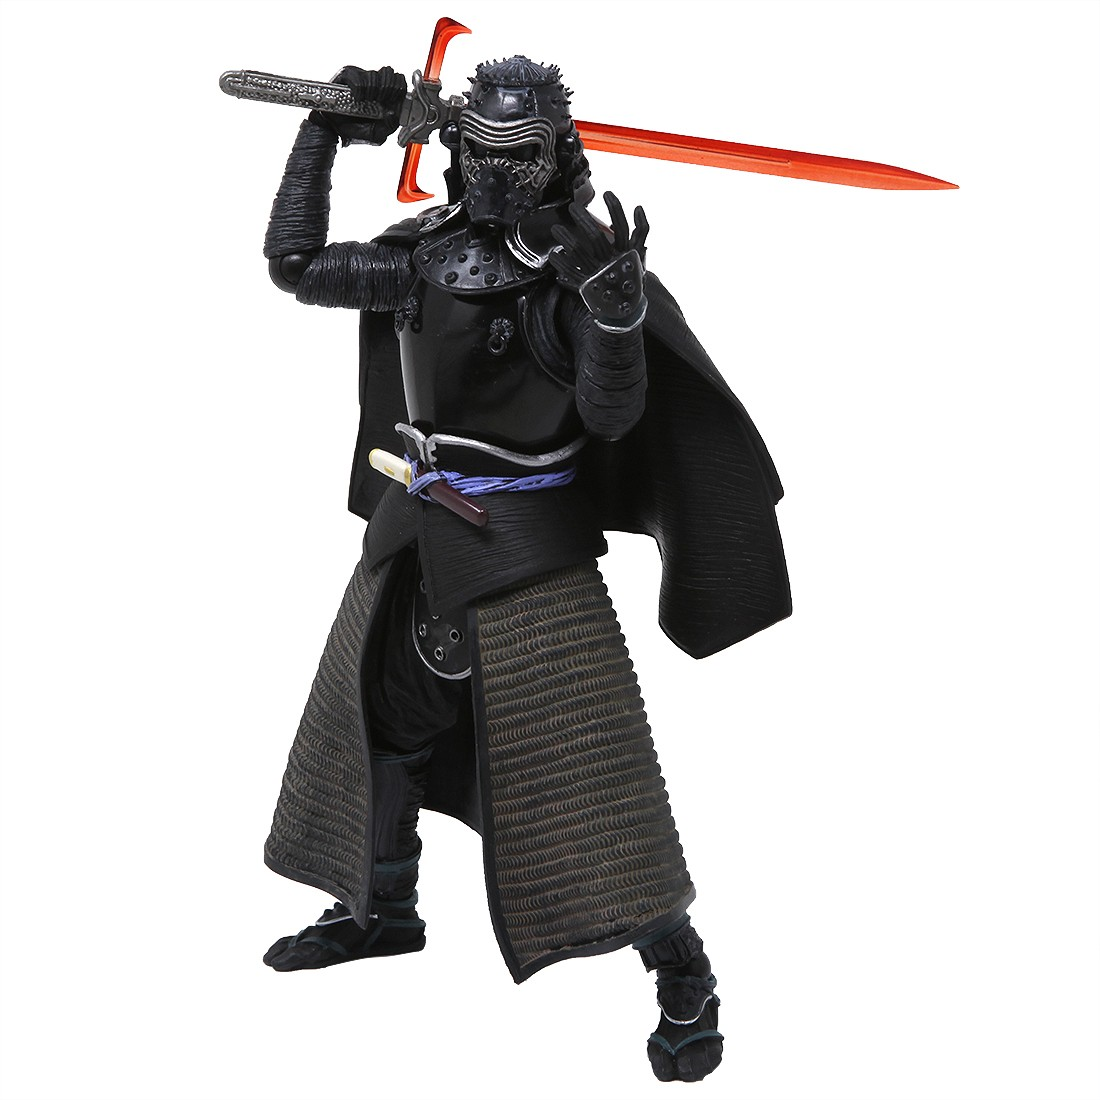 Bandai Meisho Movie Realization Star Wars Episode VII Samurai Kylo Ren Figure (black)